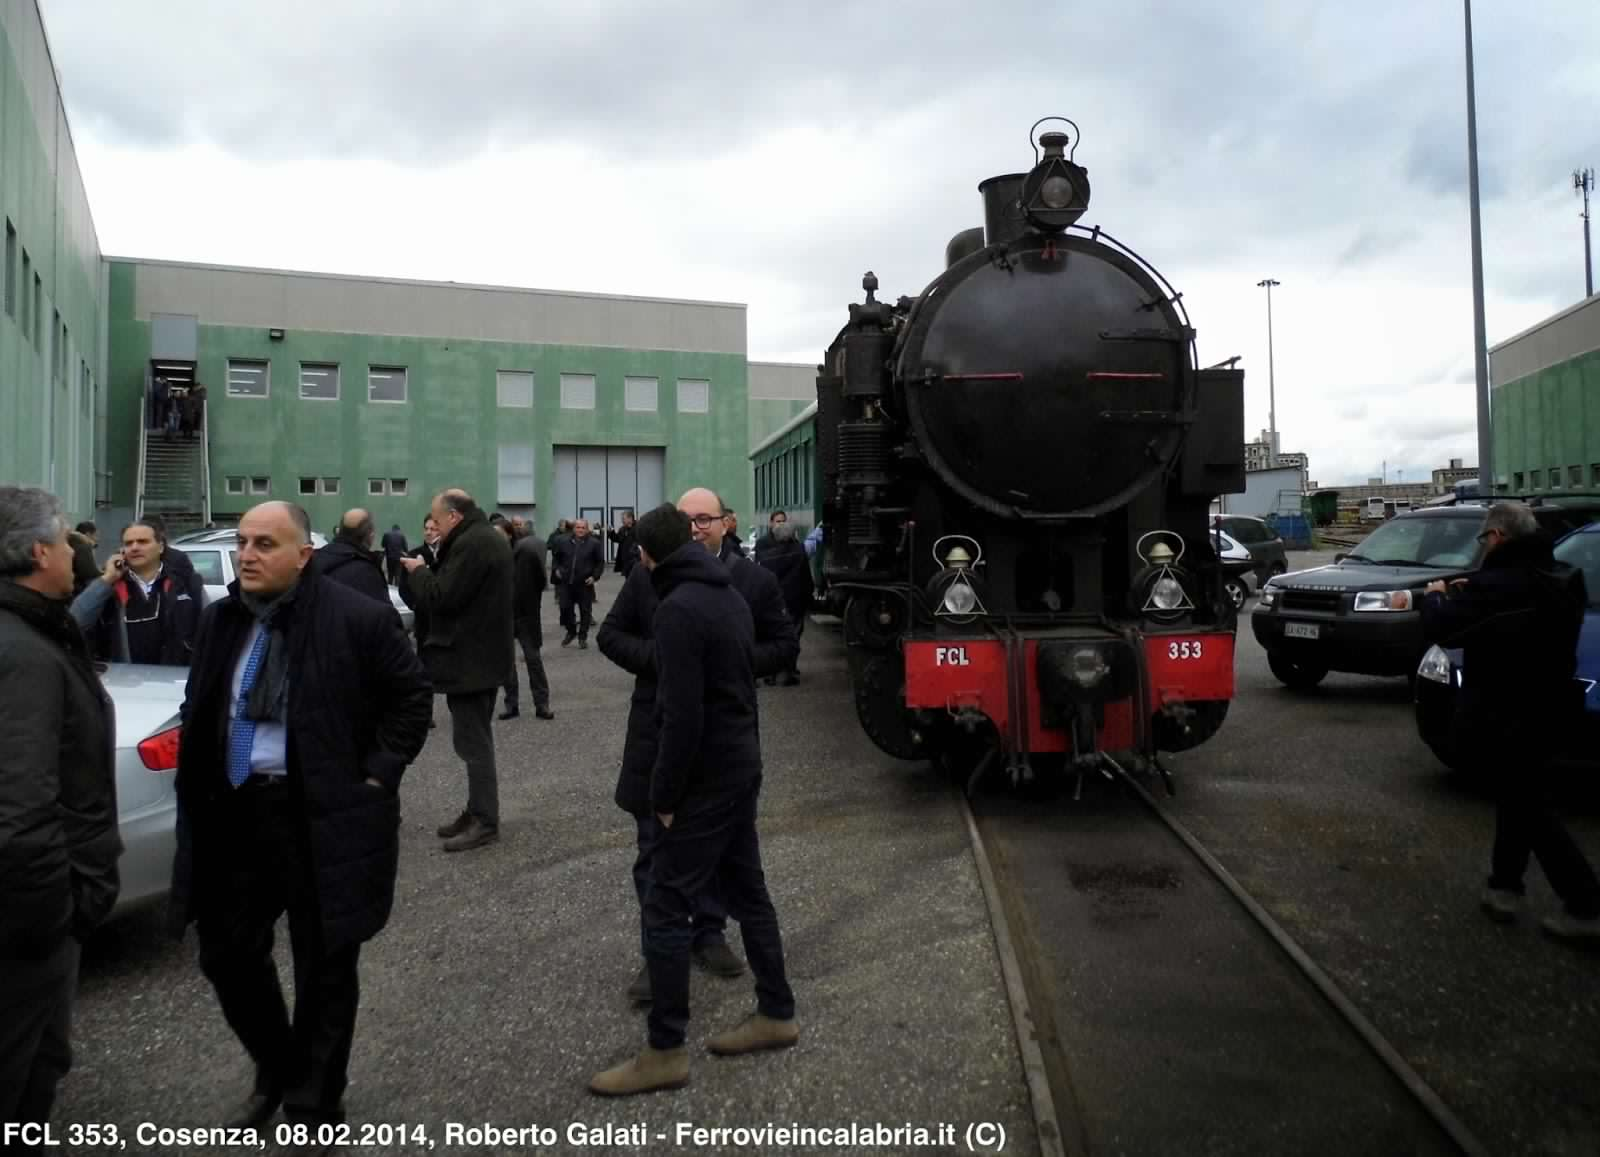 FC-loco 353vettura BCMR-Conferenza UILT-CosenzaVaglioLise-2014-02-08-RobertoGalati 1